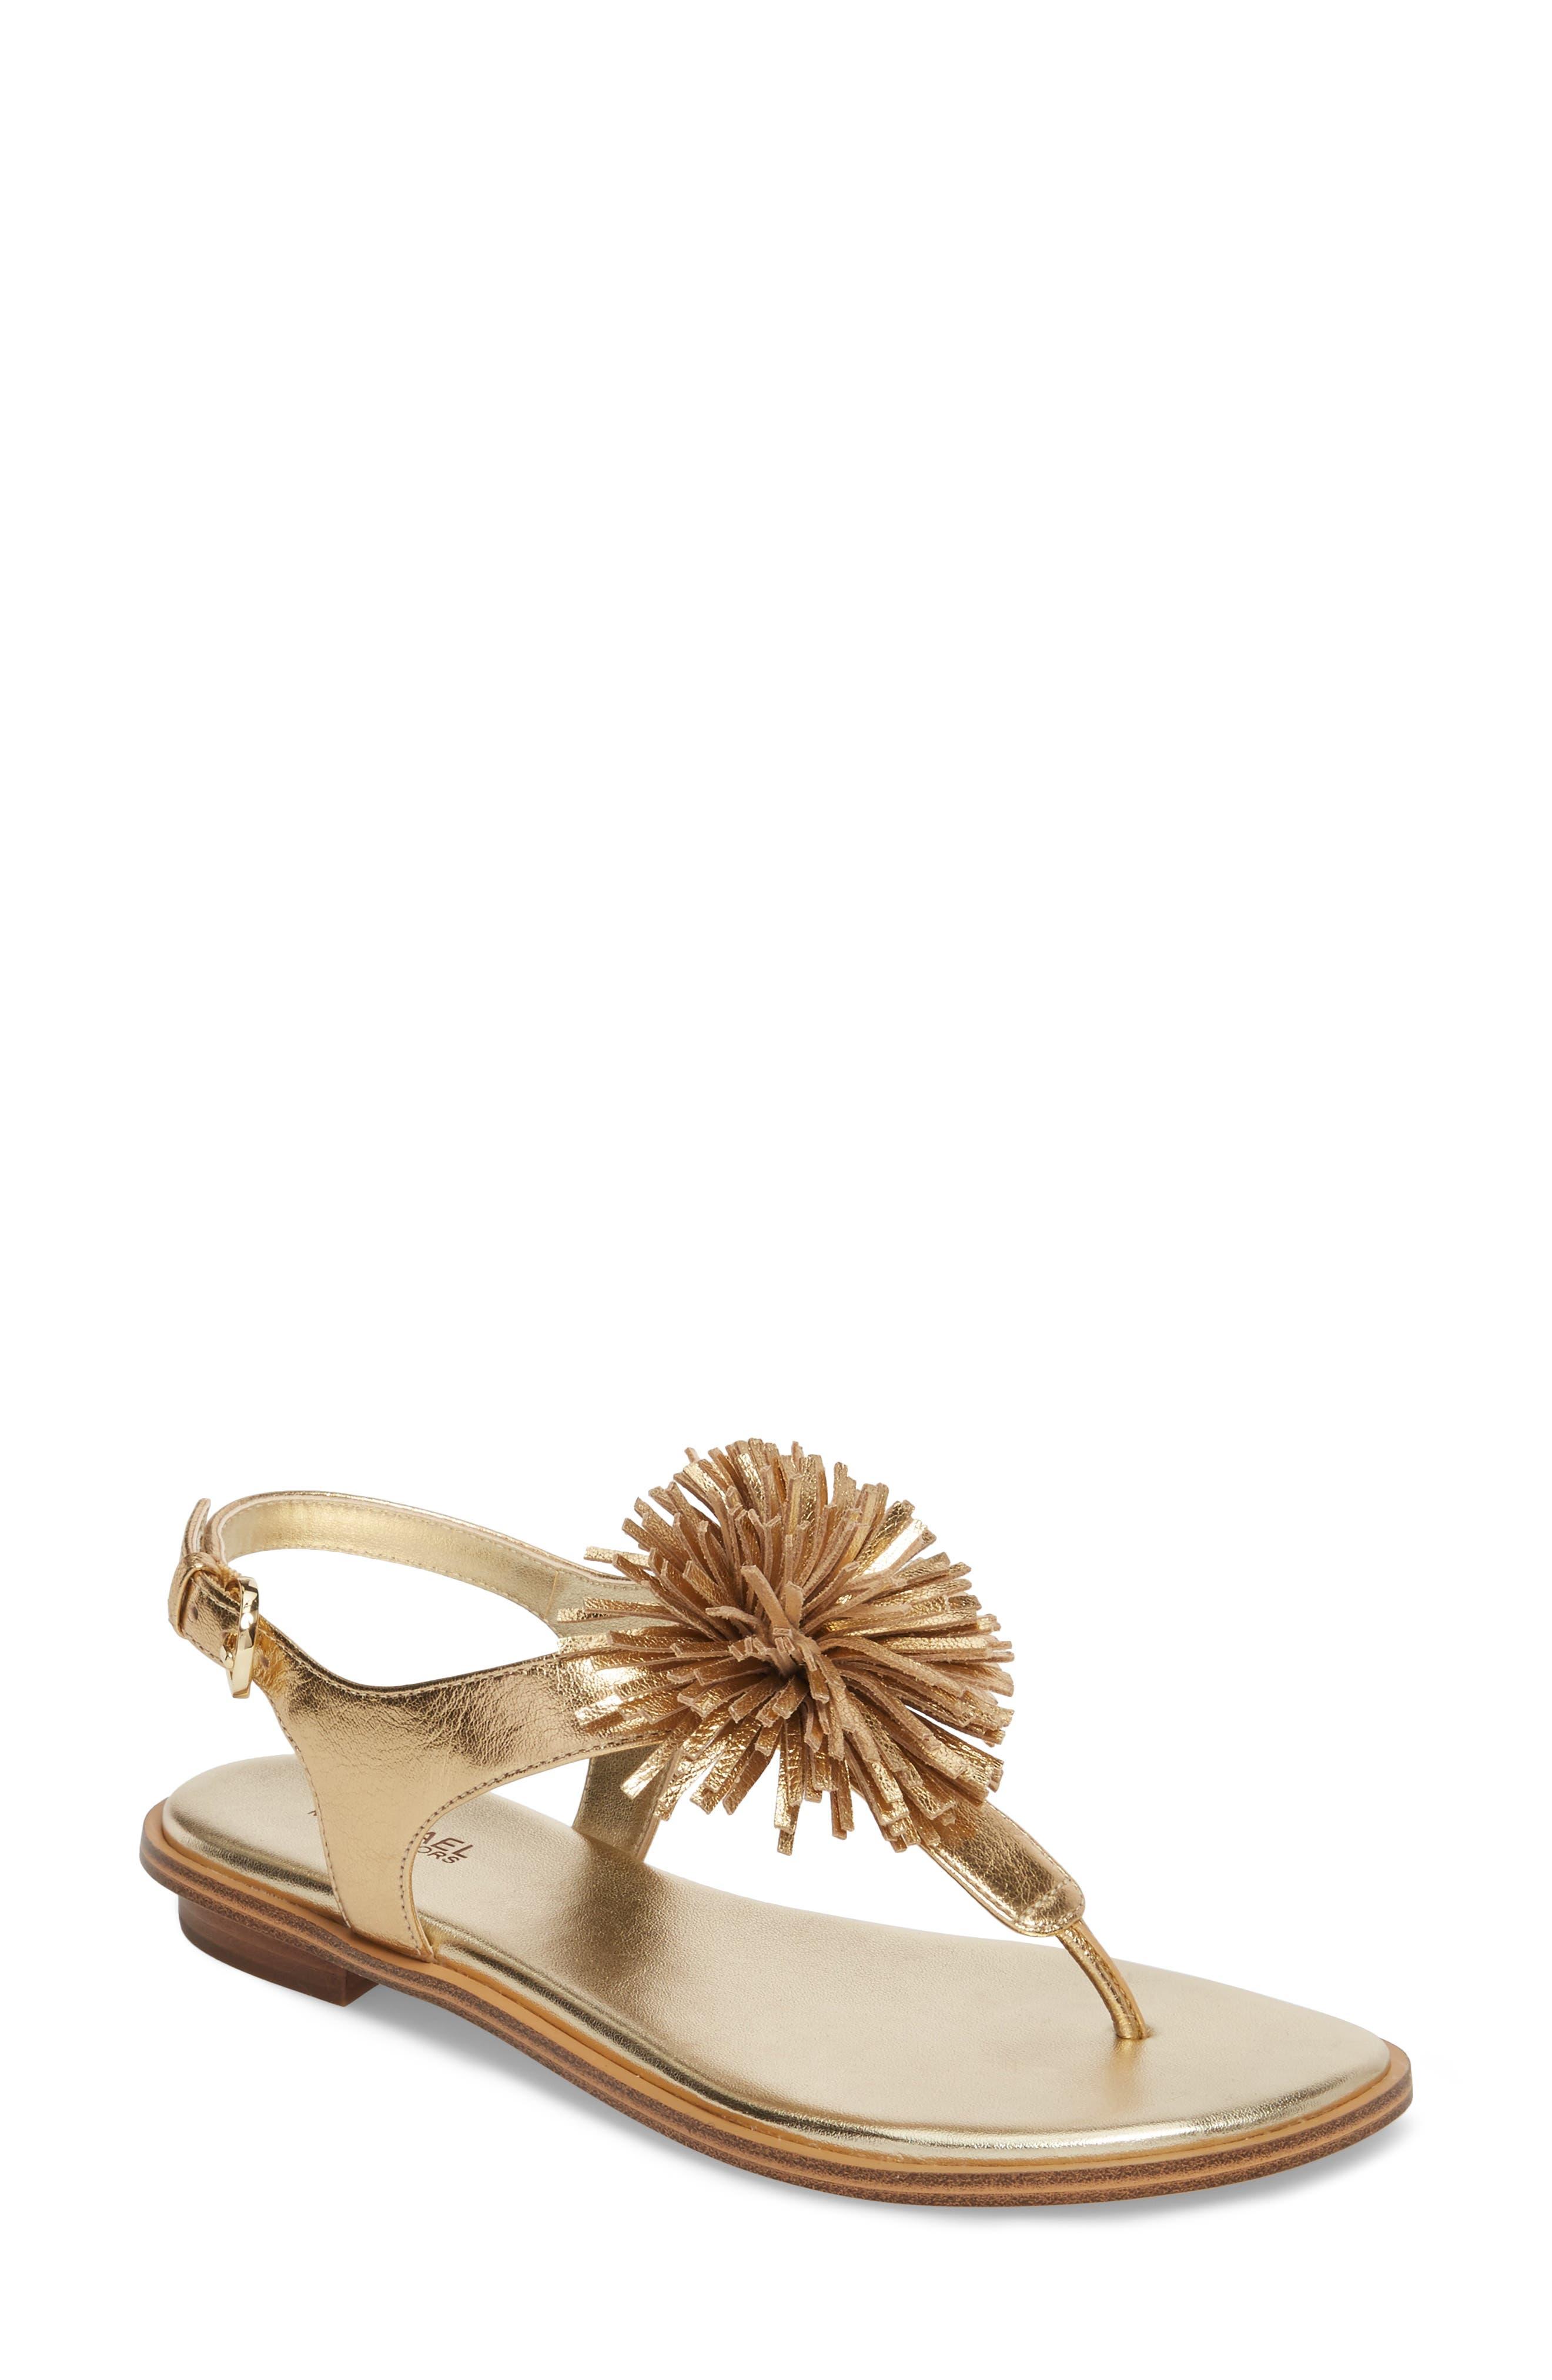 Lolita Sandal,                             Main thumbnail 1, color,                             Pale Gold Leather